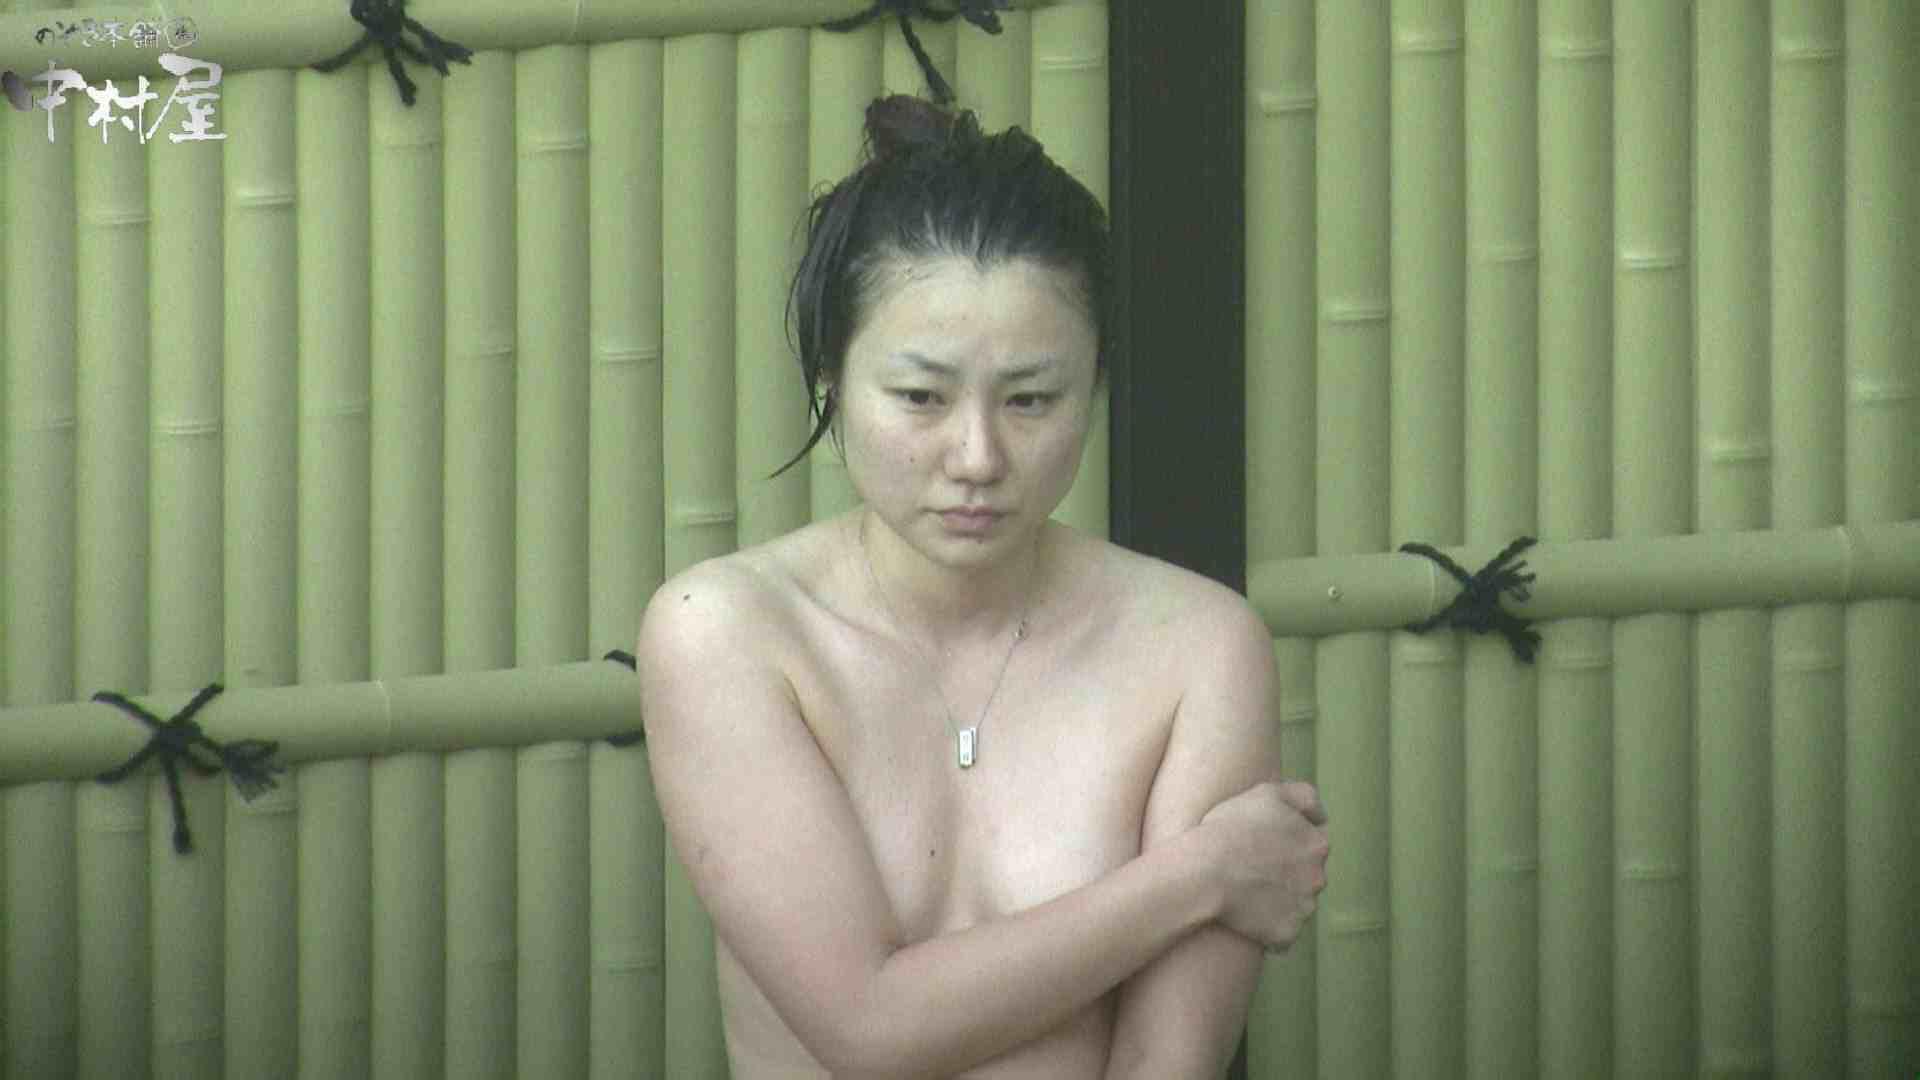 Aquaな露天風呂Vol.969 女体盗撮   OL女体  40連発 13